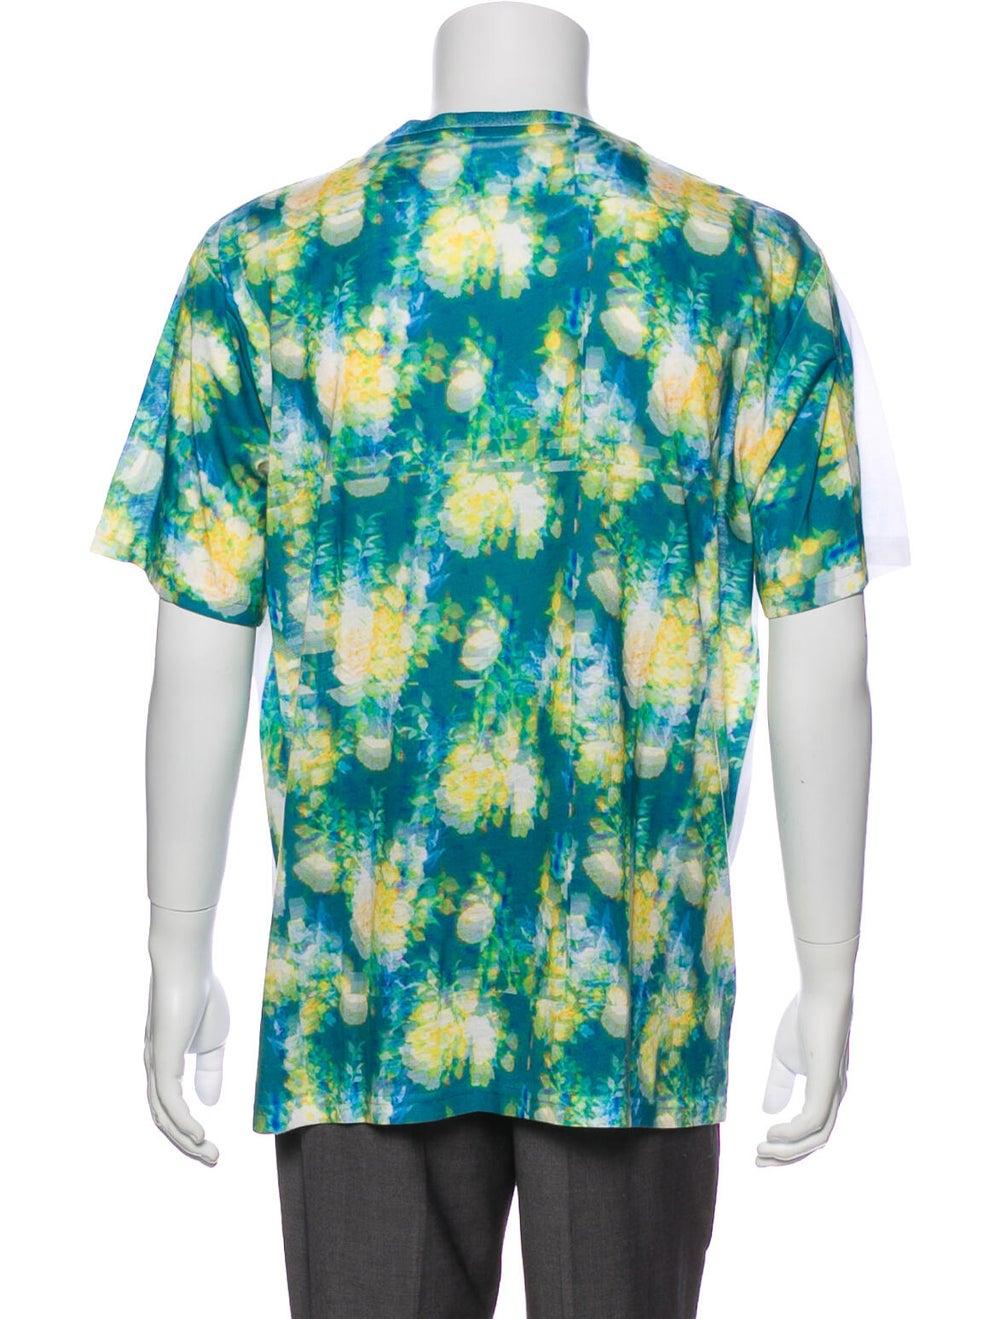 Craig Green Tie-Dye Print Crew Neck T-Shirt Green - image 3